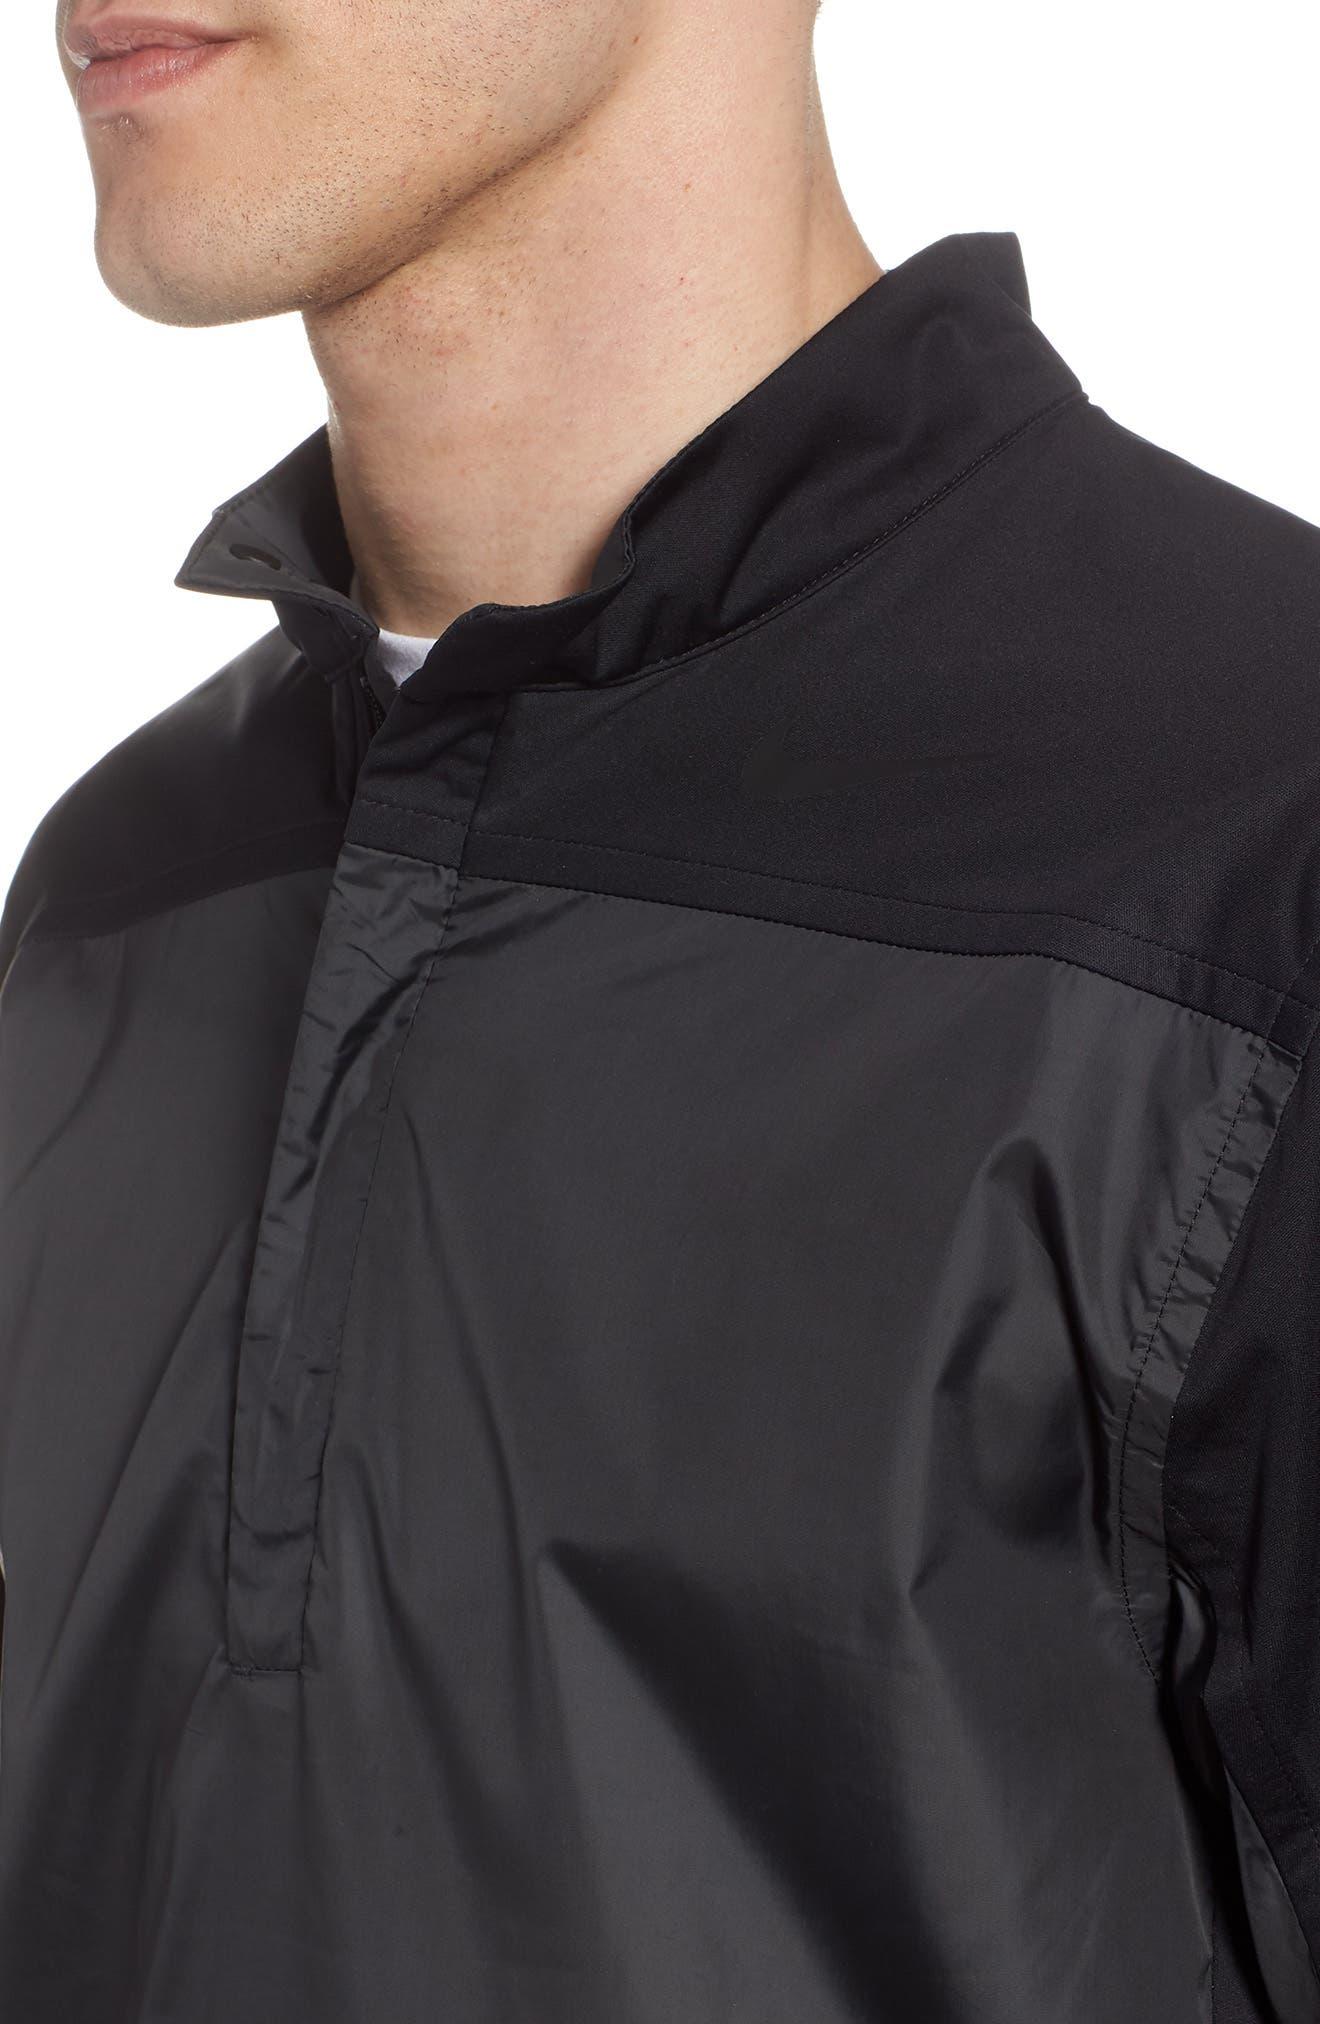 Shield Full Zip Golf Jacket,                             Alternate thumbnail 4, color,                             Black/ Silver